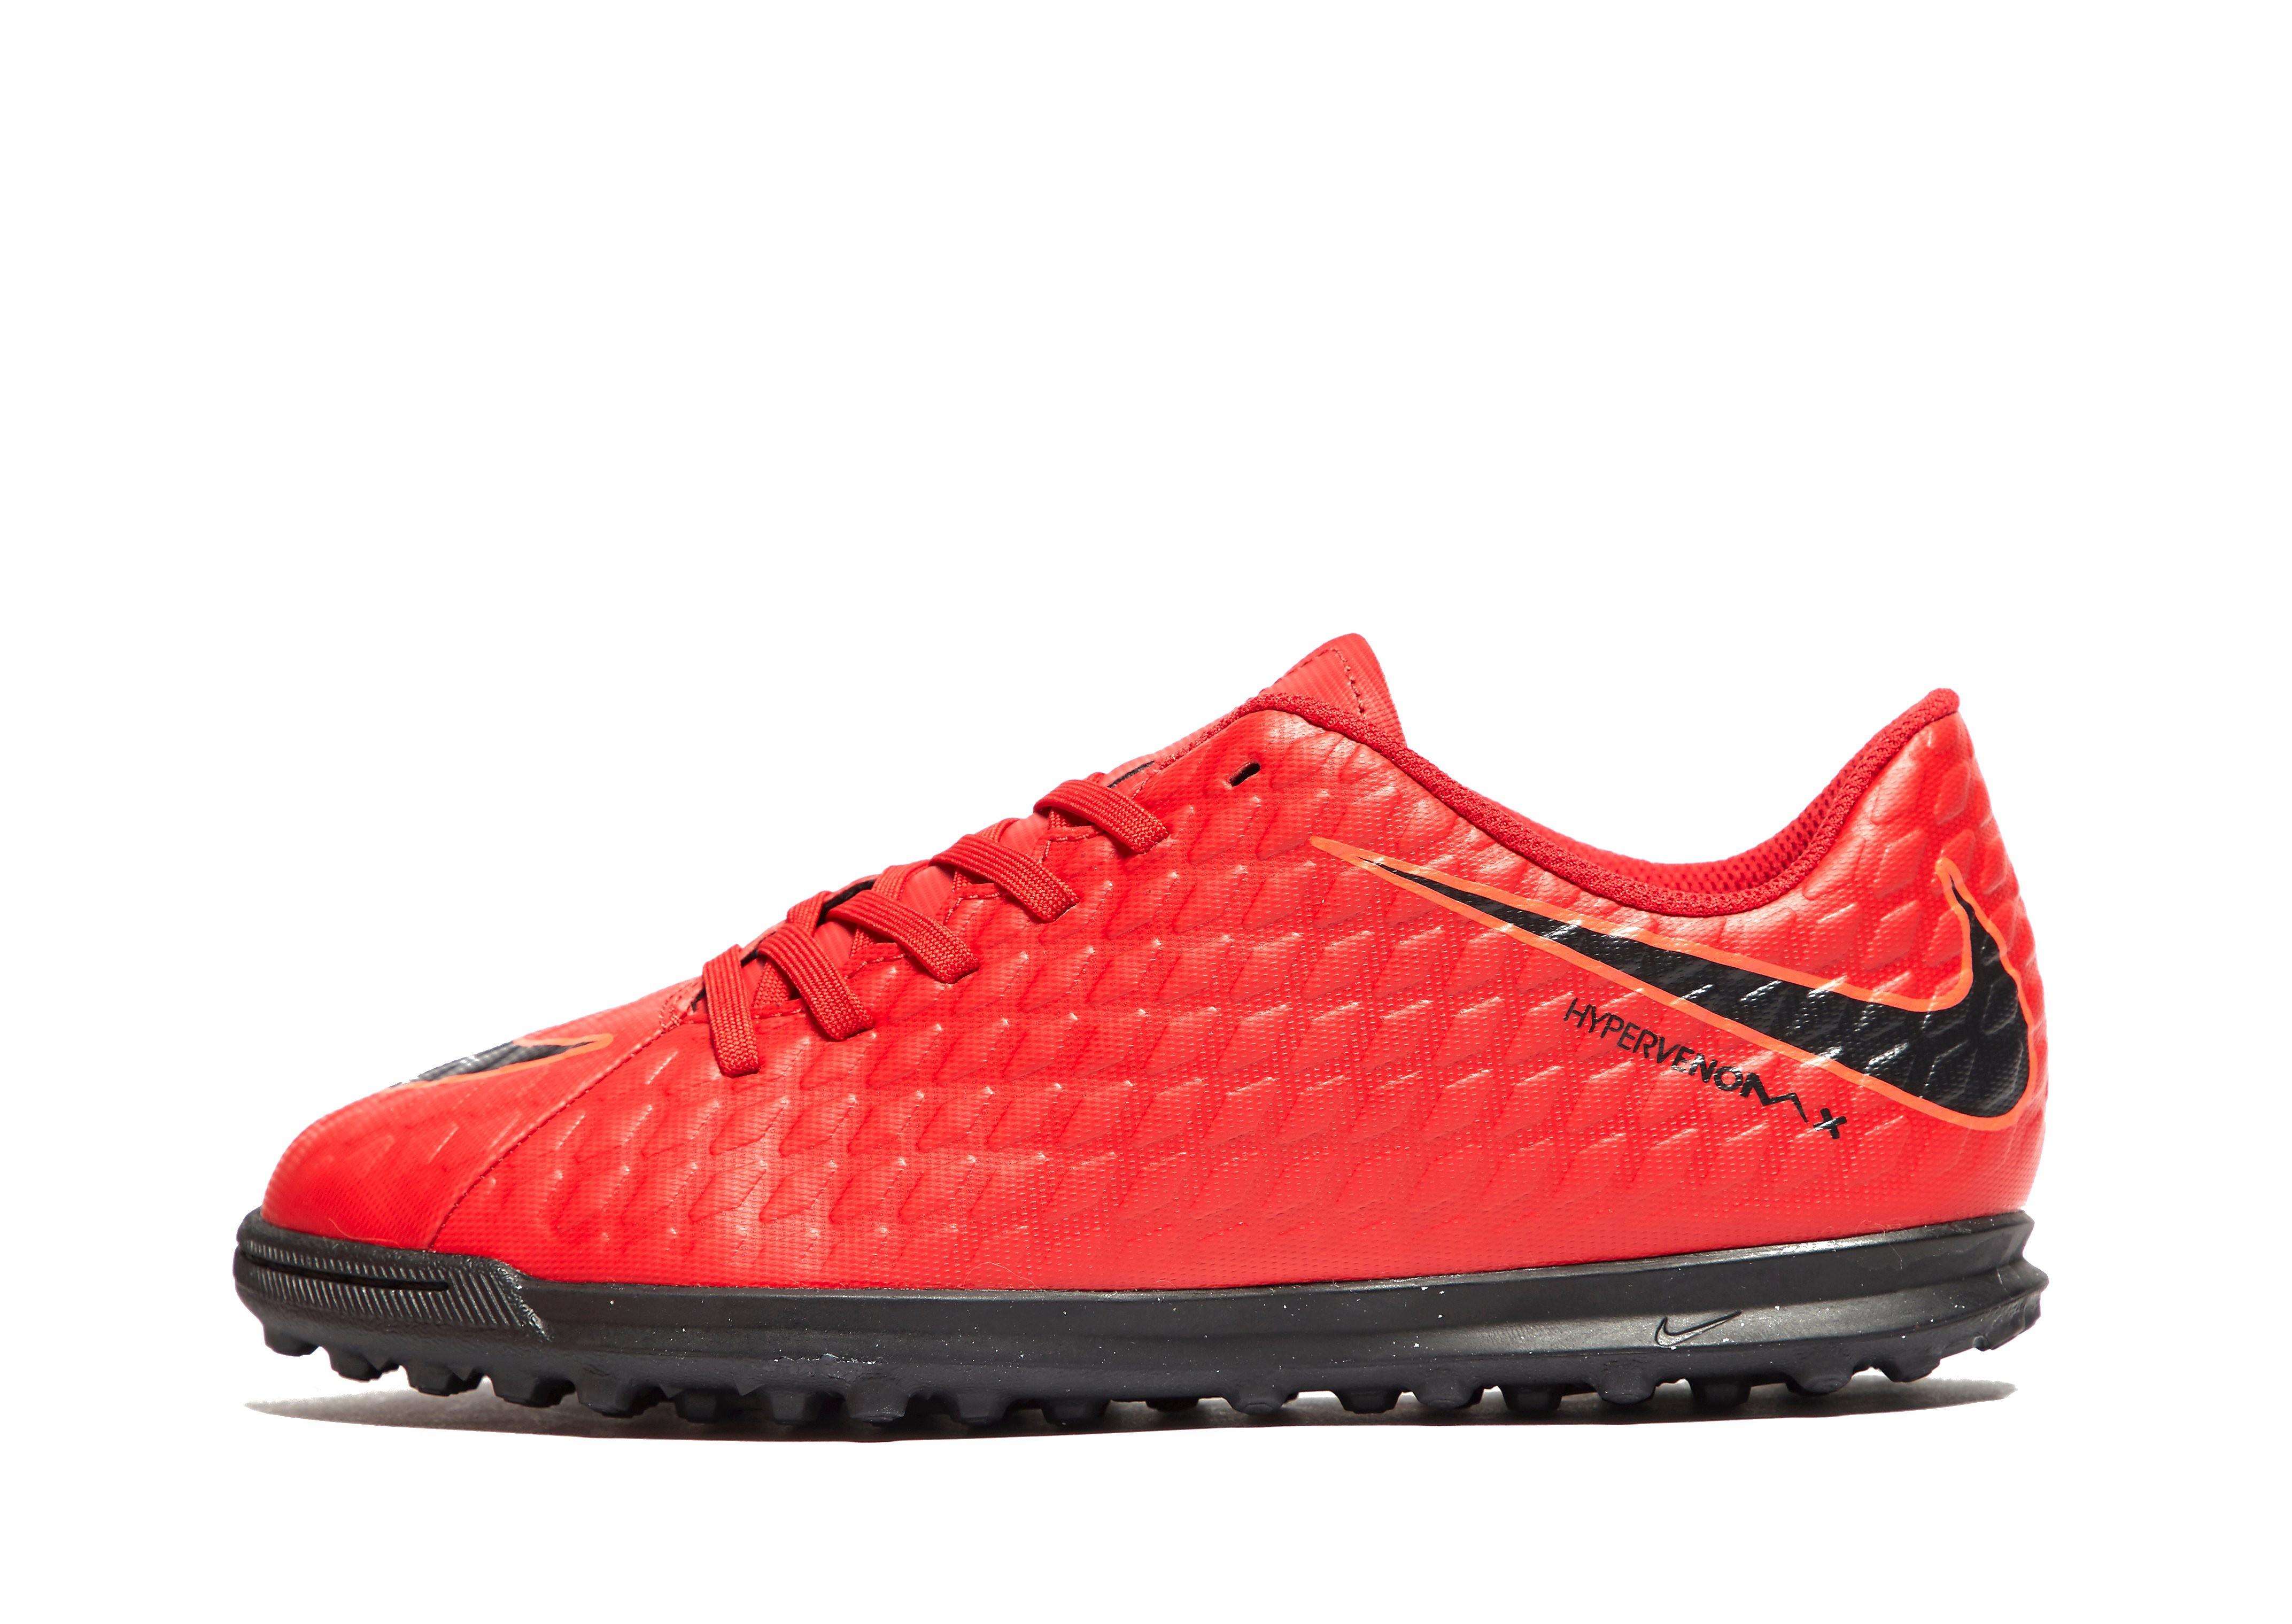 Nike Fire and Ice Hypervenom Phade II TF Children